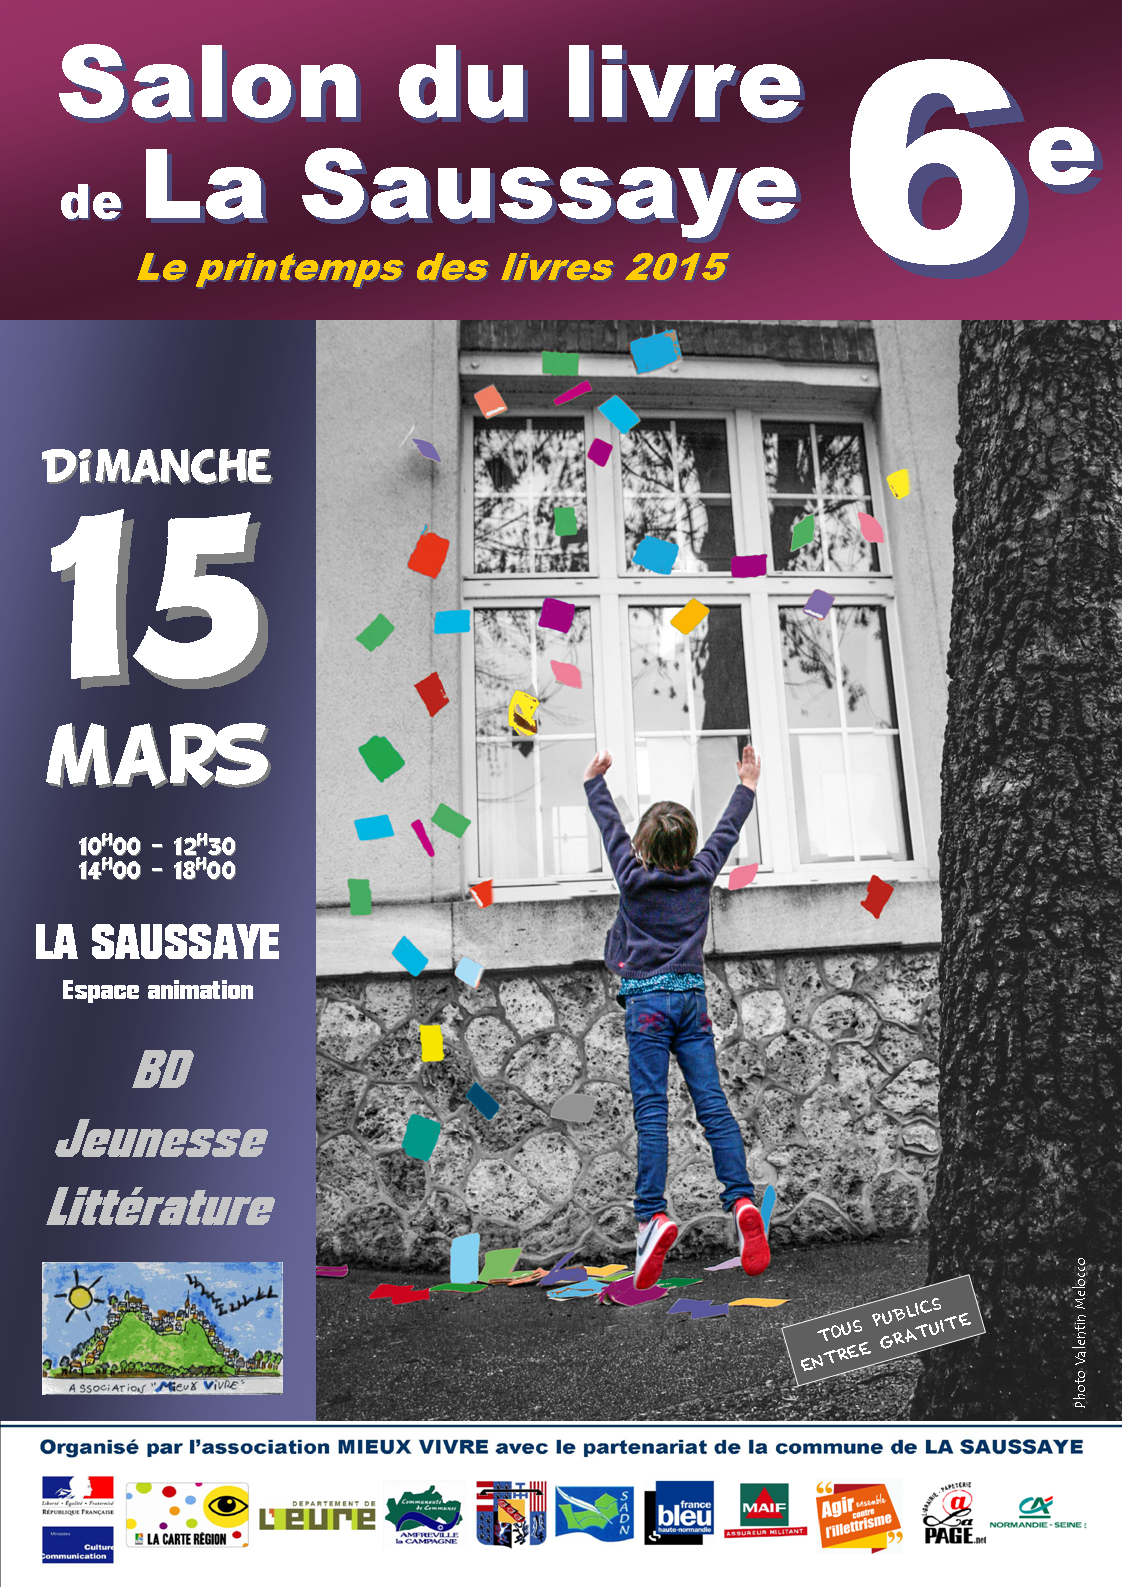 La Saussaye , dimanche 15 mars